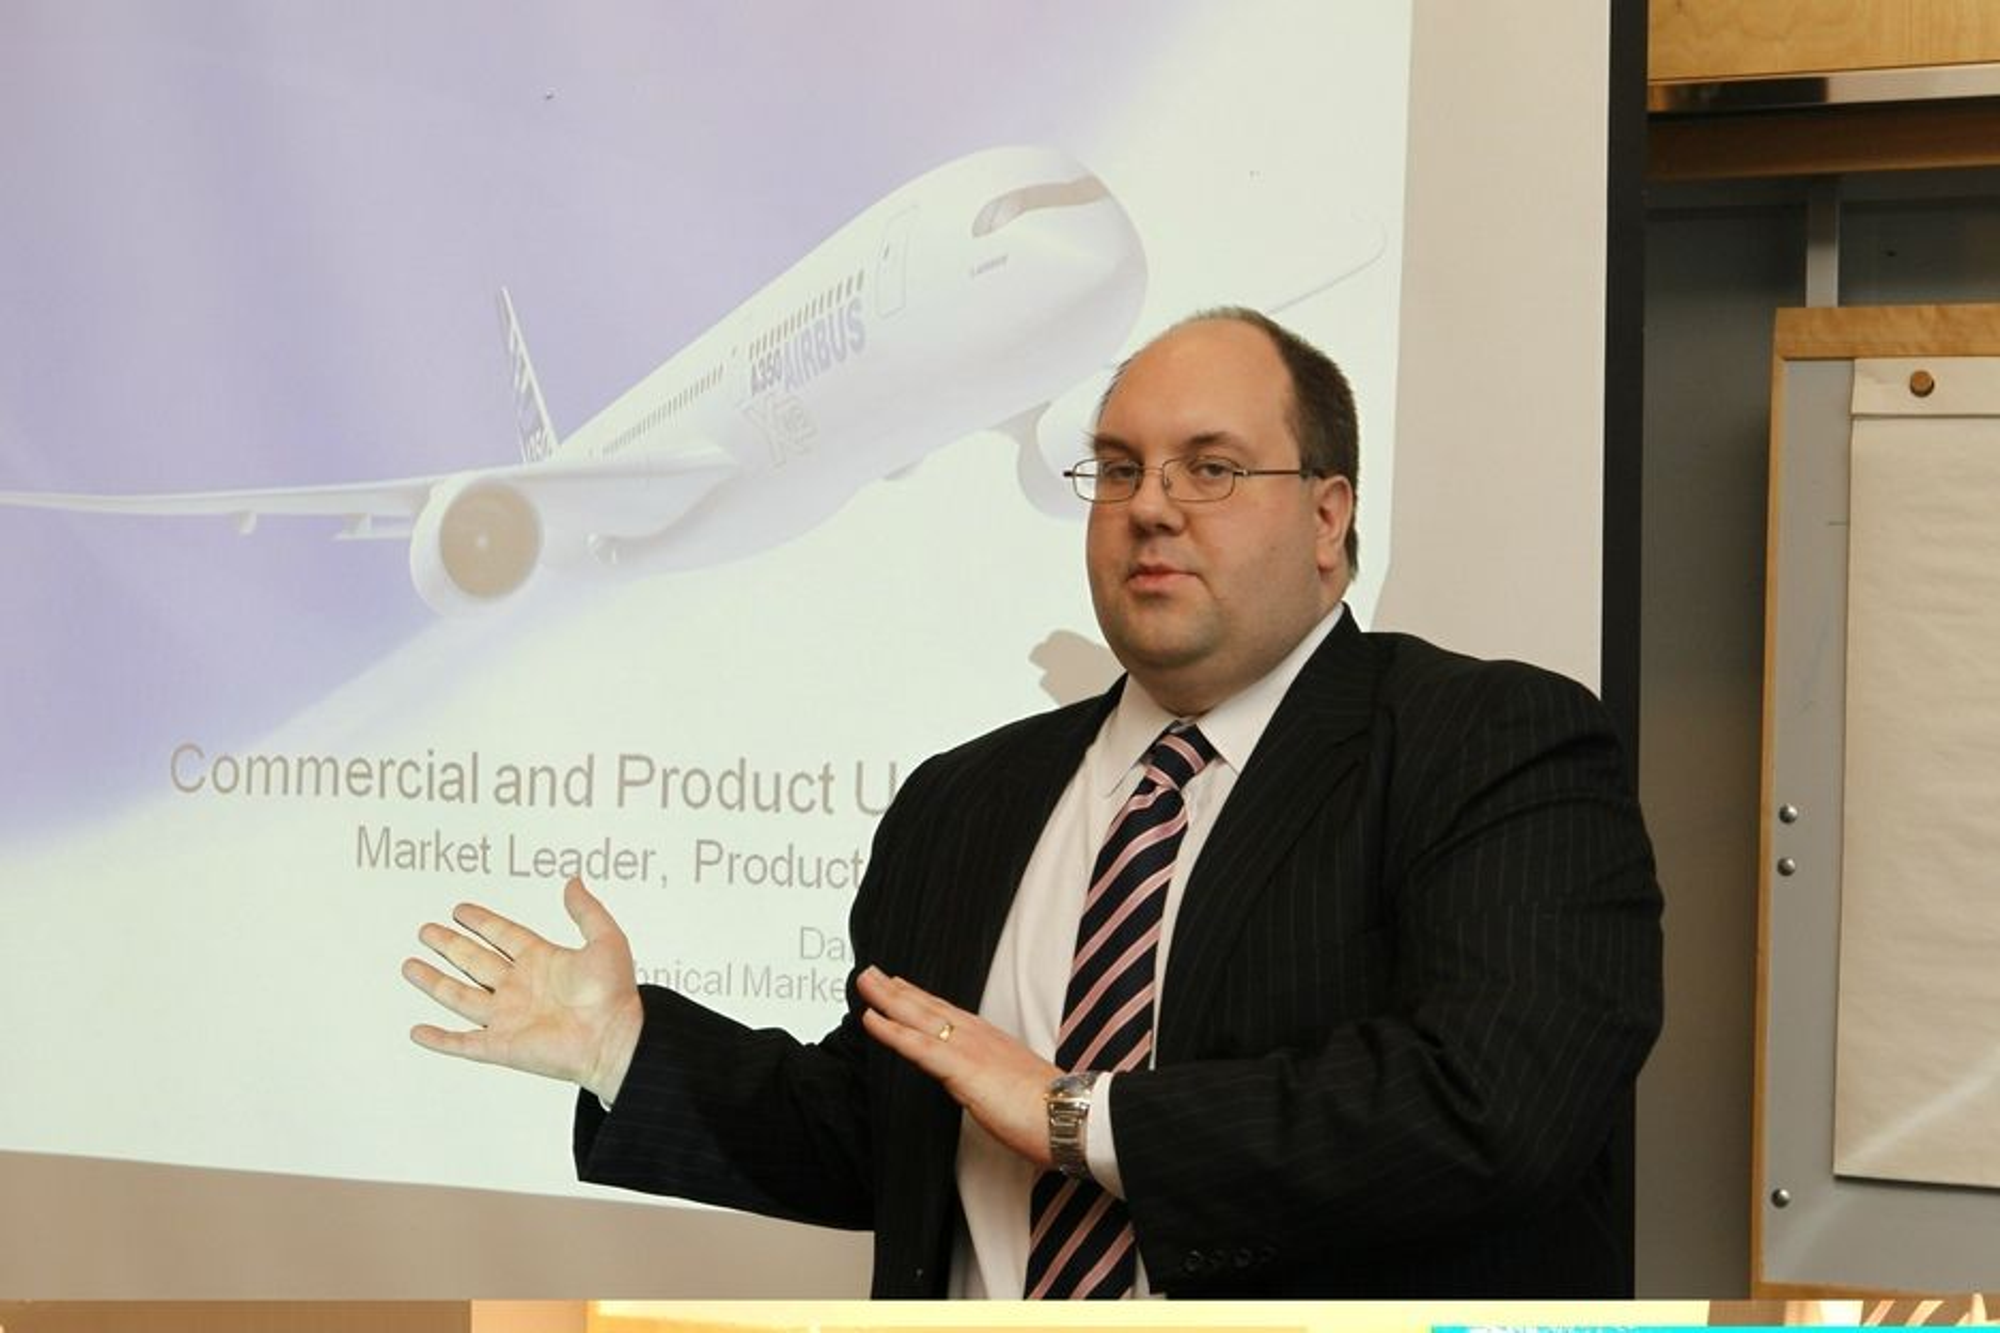 BEHOV: Daniel Carnelly, som er konsernsjef for produkt i Airbus, orienterte i Oslo tirsdag om sitt og dermed Airbus' syn på behovet for nye fly i det norske og nordiske luftmarked de neste 20 år.